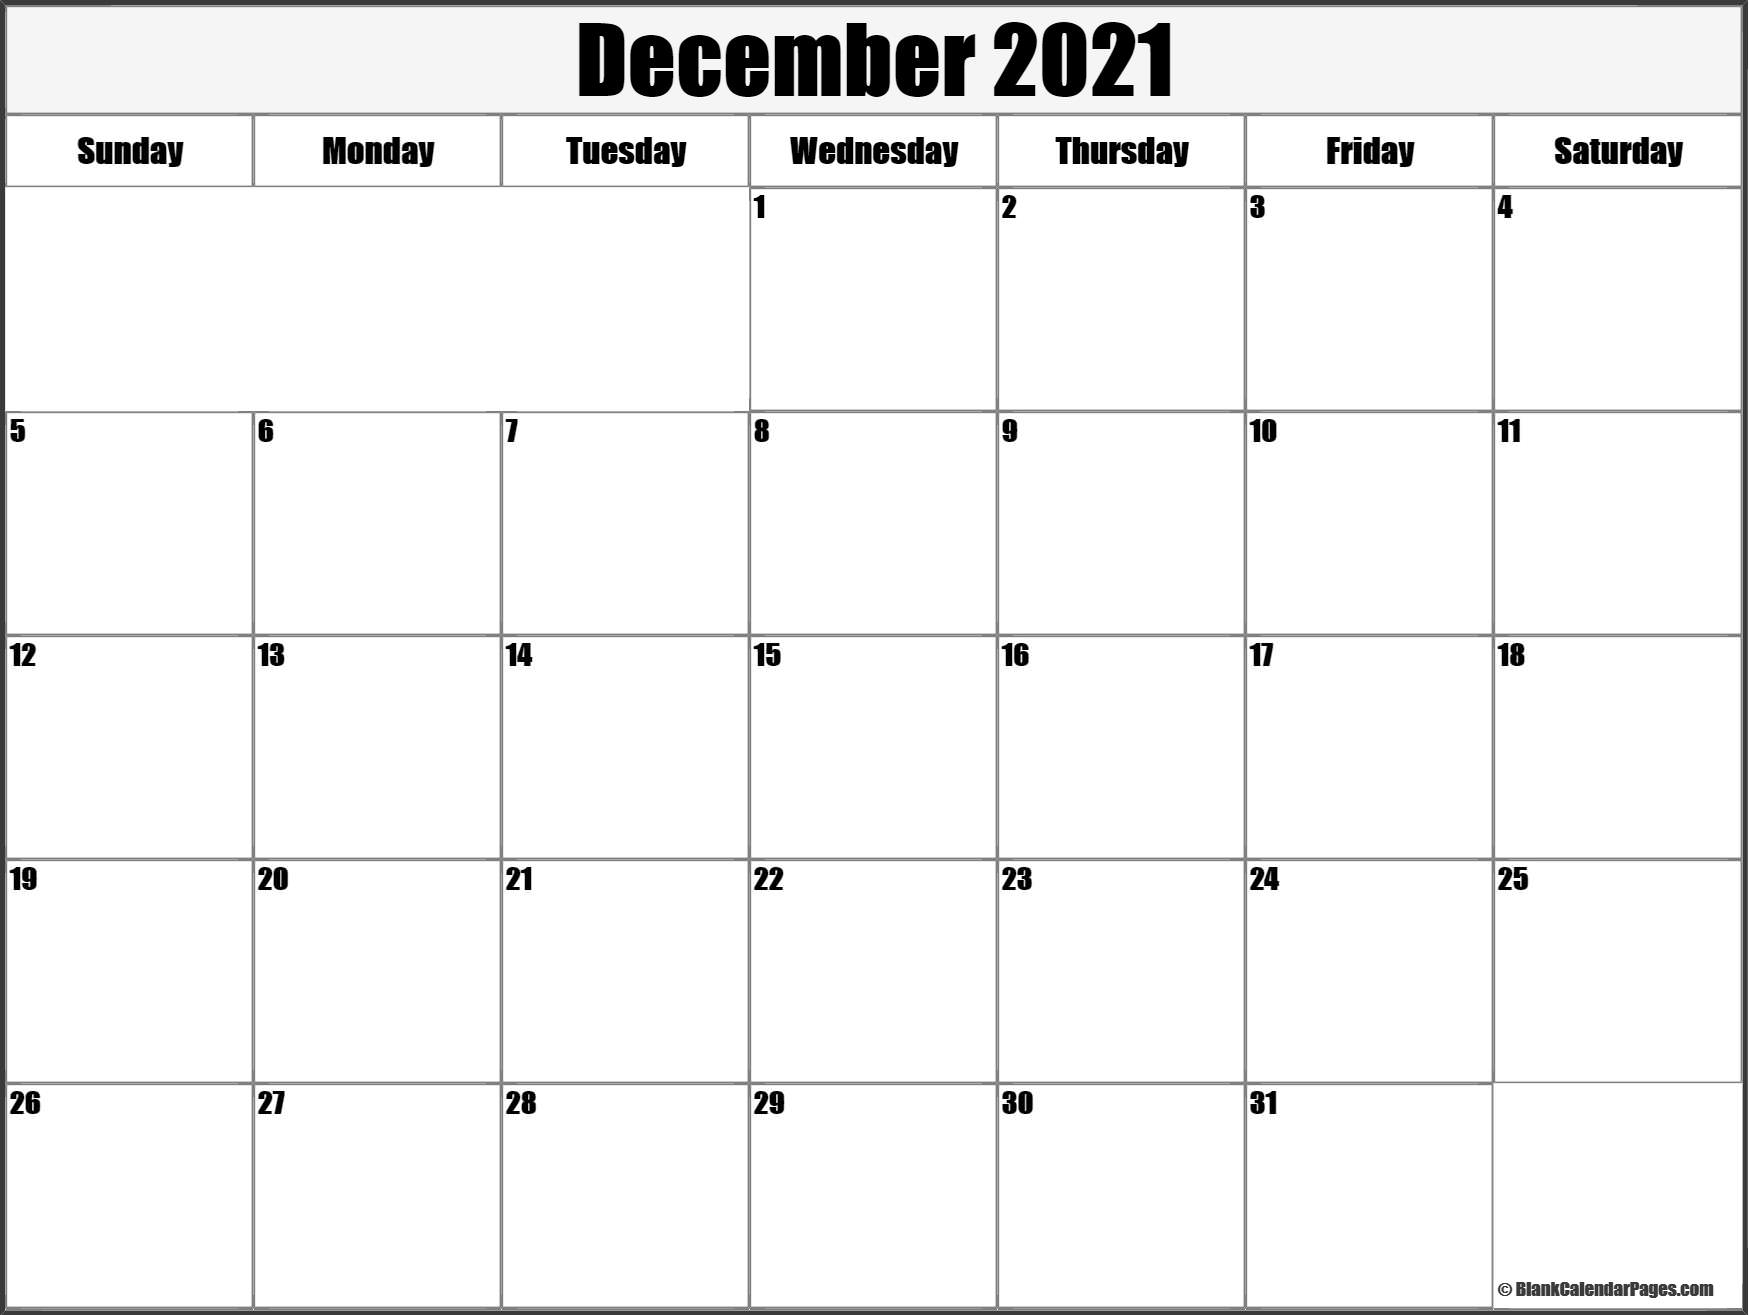 December 2021 Blank Calendar Templates.